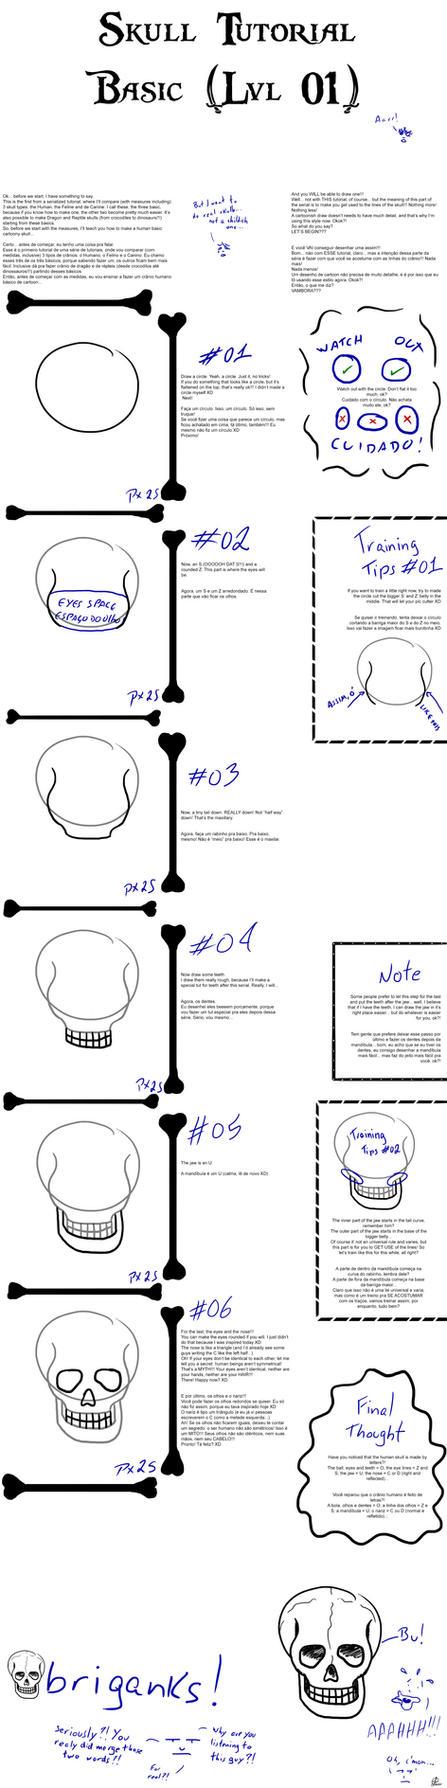 Skull Front Tutorial by jowcordeiro